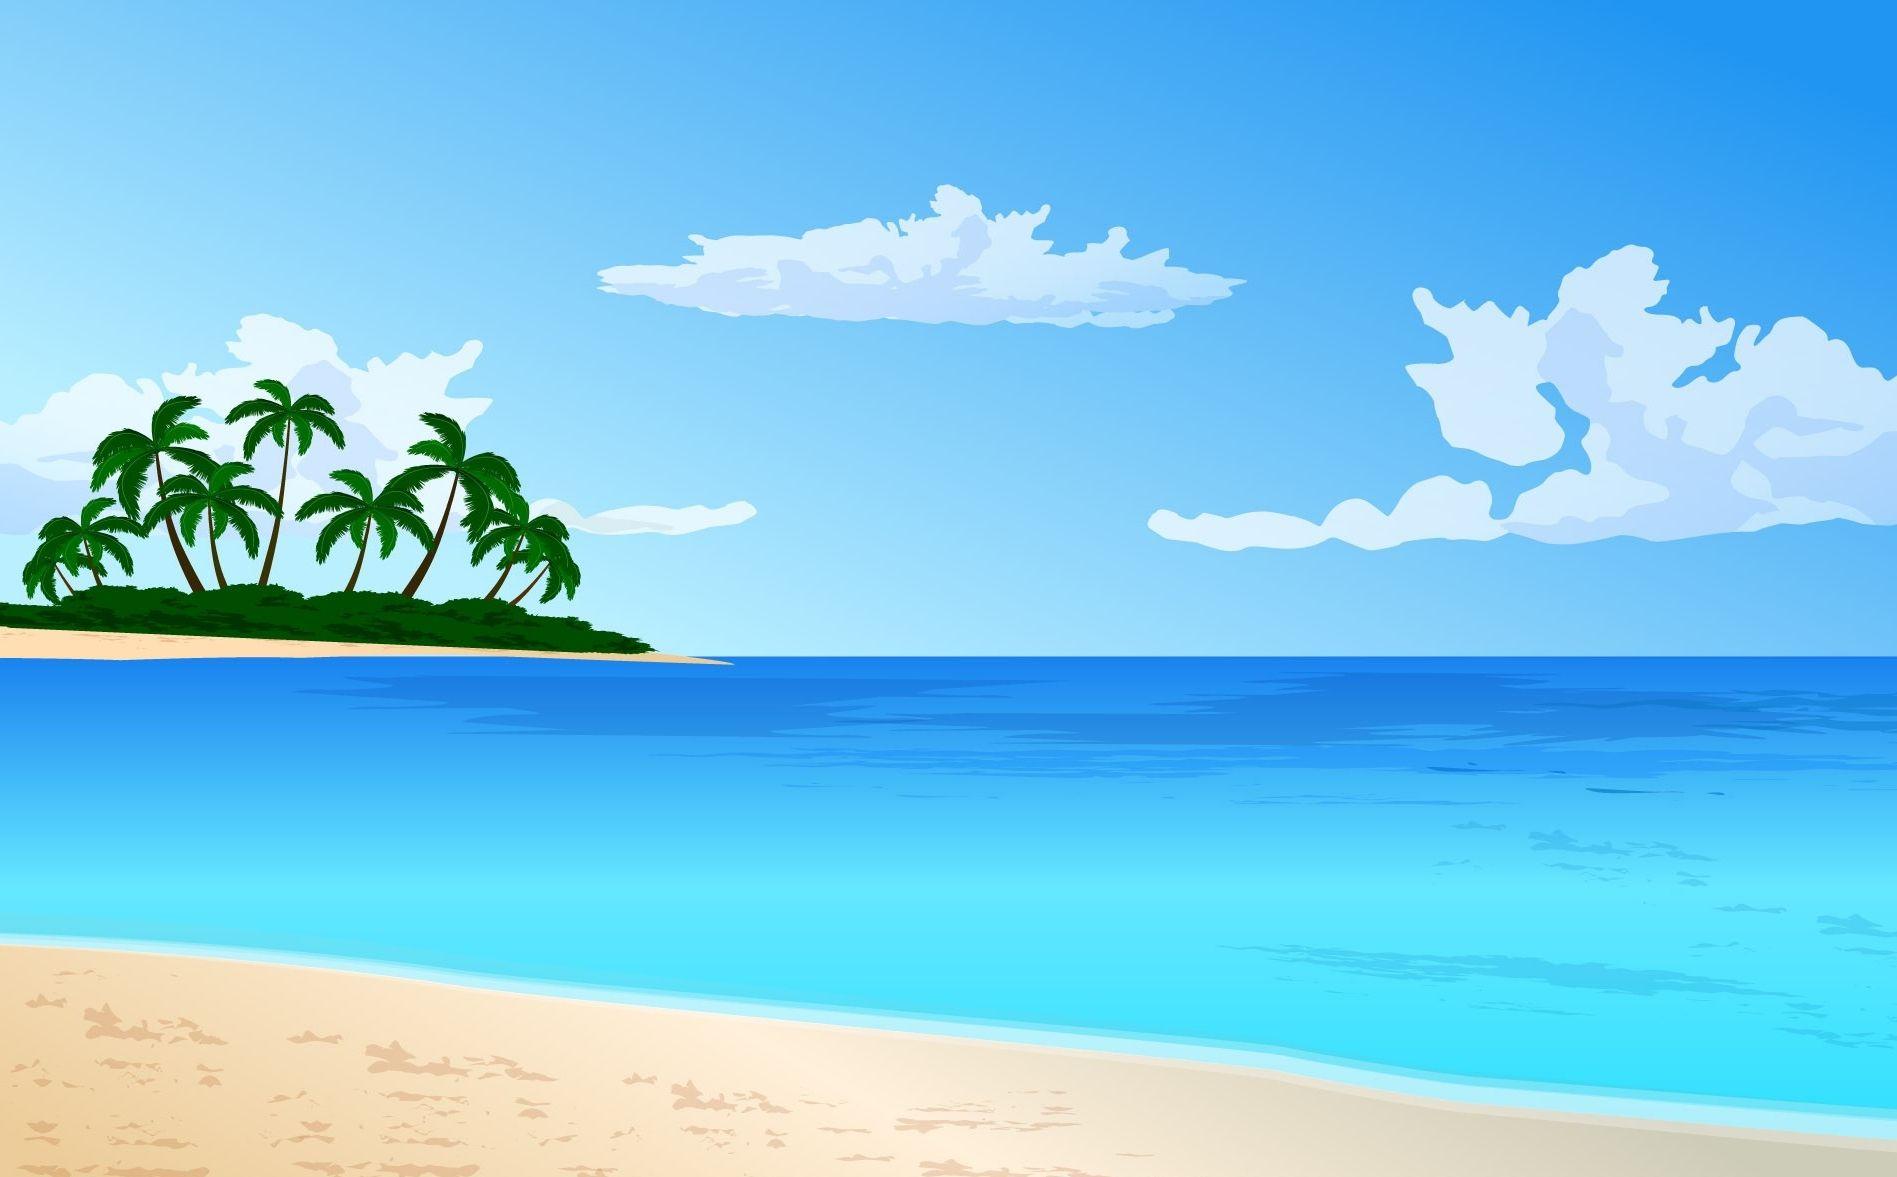 Animated Beach Scene Desktop Wallpaper: HDWallpaperFX In 2019